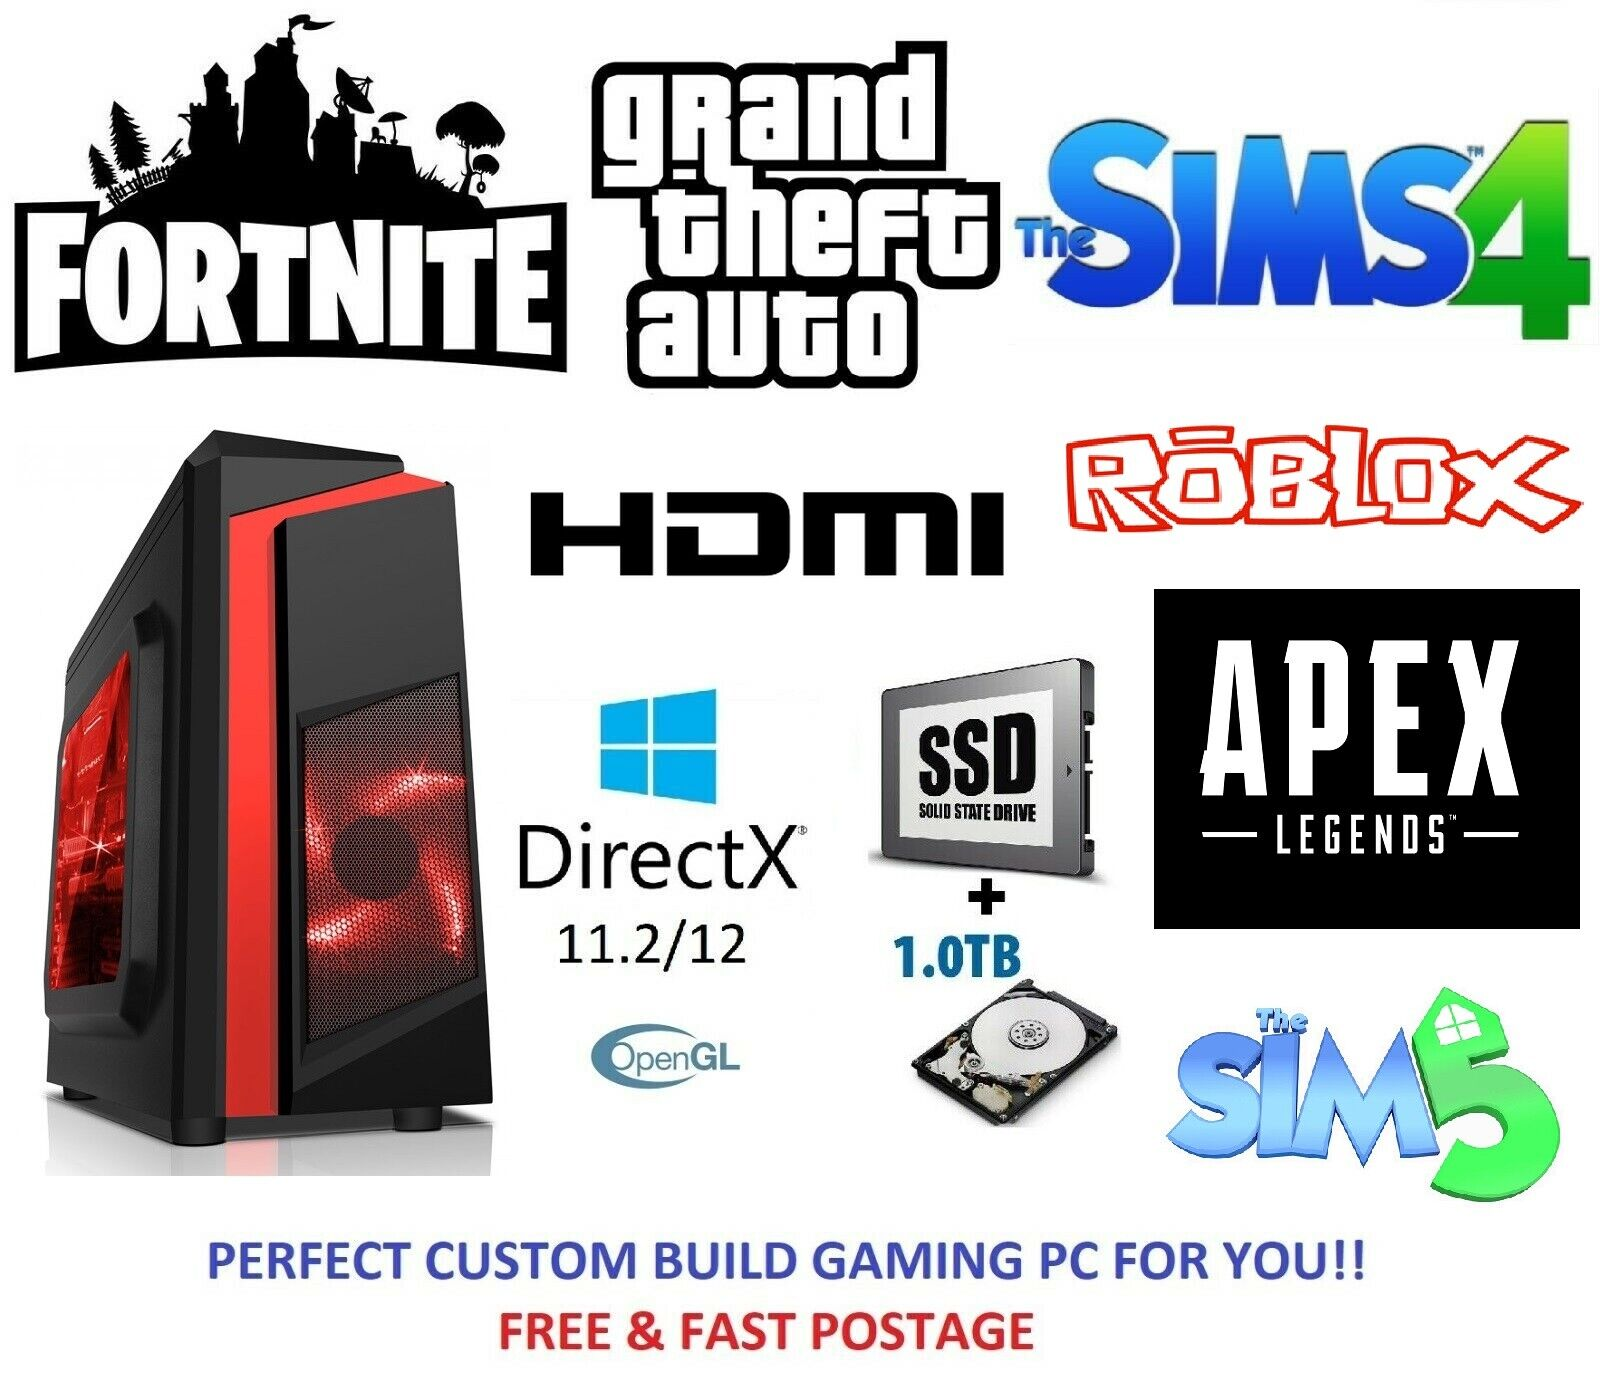 Computer Games - Fast Gaming PC Computer Intel Quad Core i5 16GB 120GB SSD 1TB 2GB GTX 710